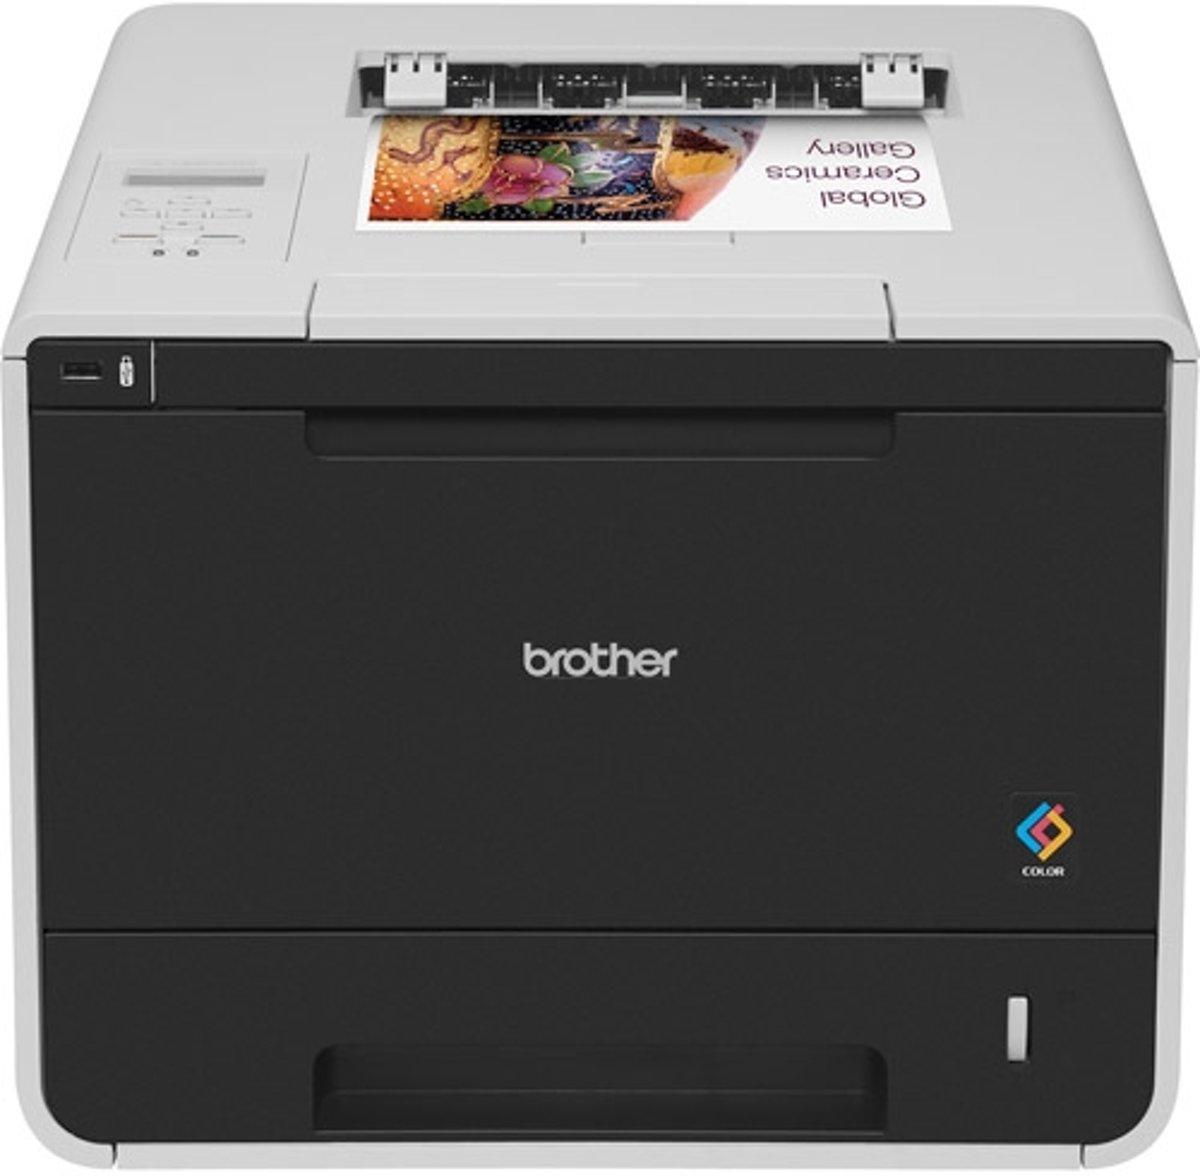 Brother HL-L8350CDW - Kleurenlaserprinter